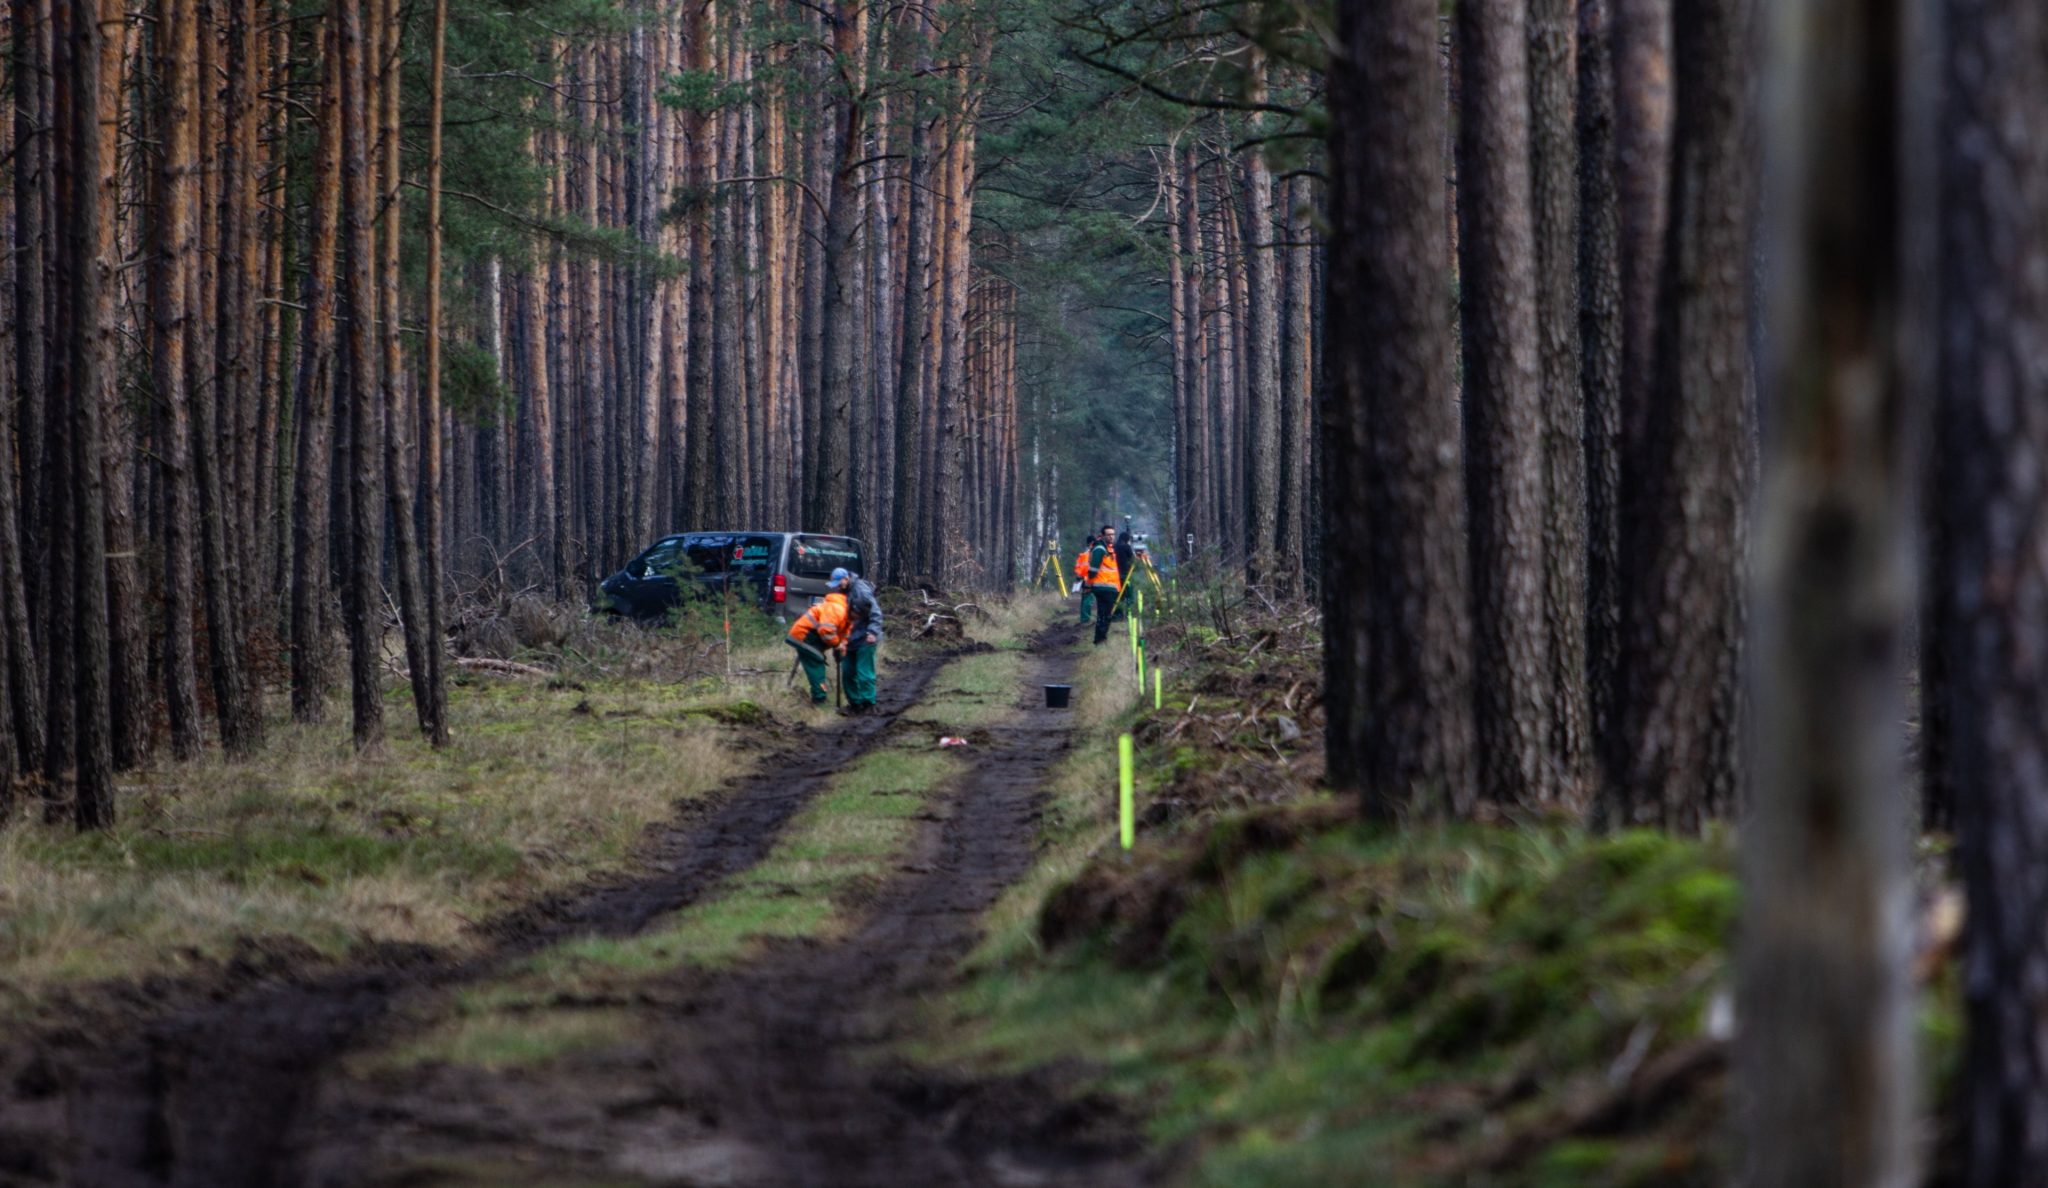 gf4-trees-clearing-2048x1188.jpg